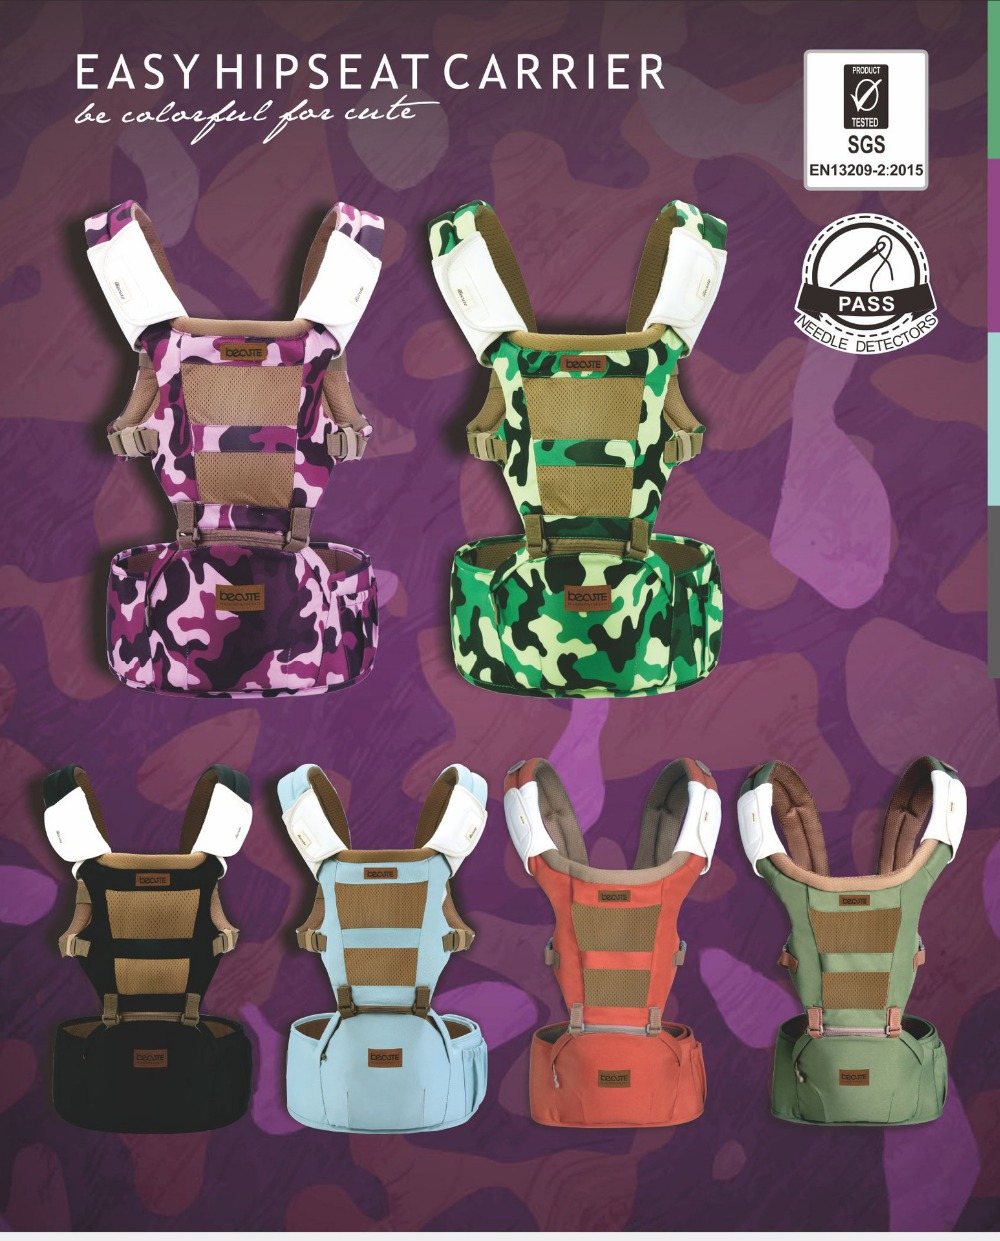 New Baby Carriers Ergonomic Baby Carrier Coat Backpack Carrier Stool Hipseat For Newborn Kangaroo Baby Sling 20kg Heaps baby carrier ergonomic re hold infant backpack carriers for baby care toddler sling kangaroo baby suspenders